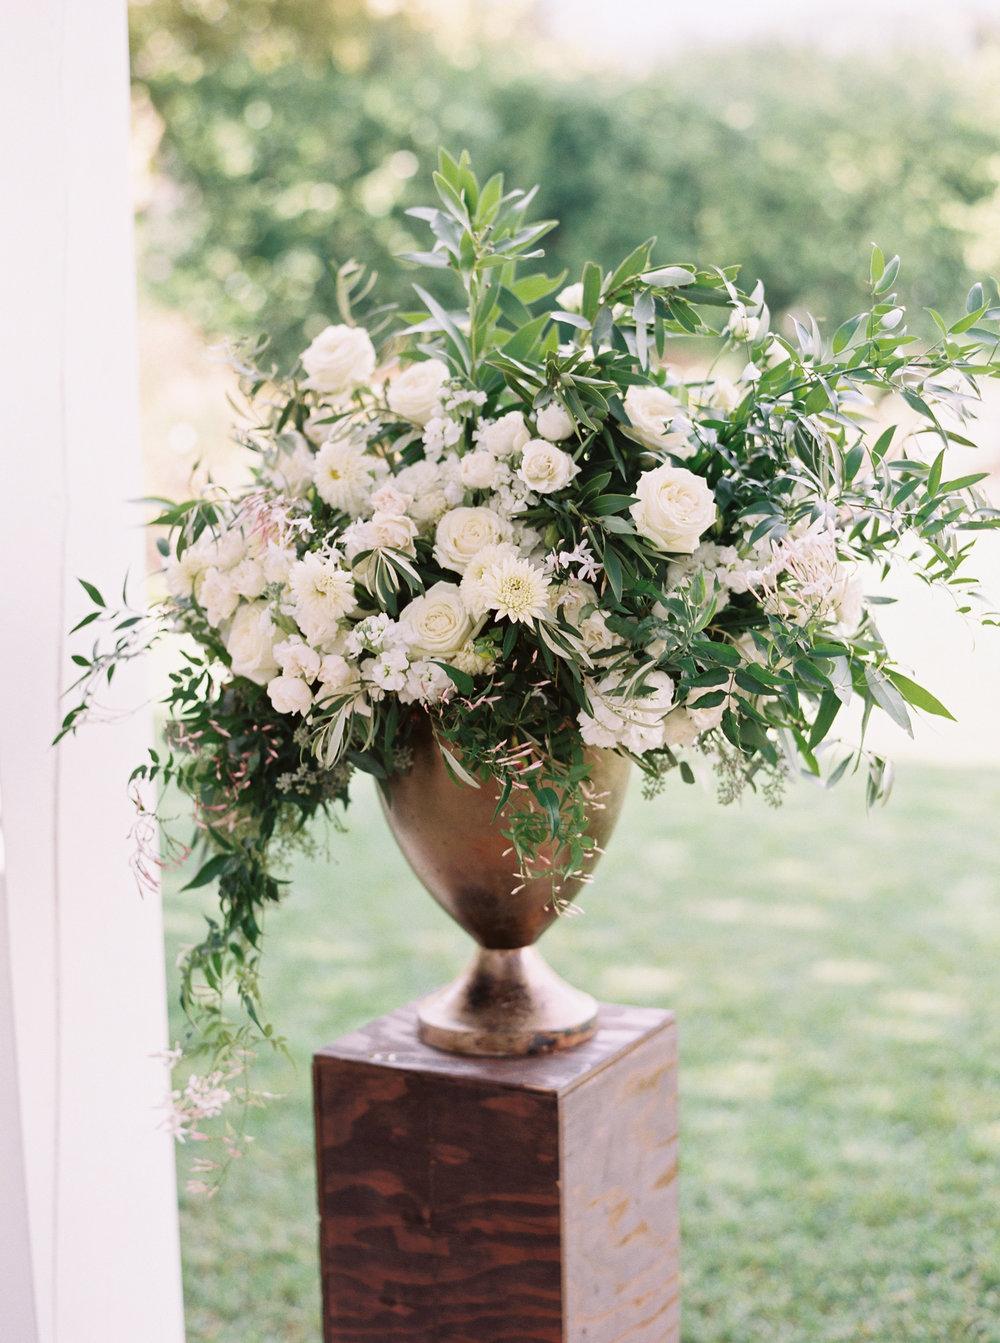 intimate-wedding-at-solage-calistoga-in-napa-145.jpg